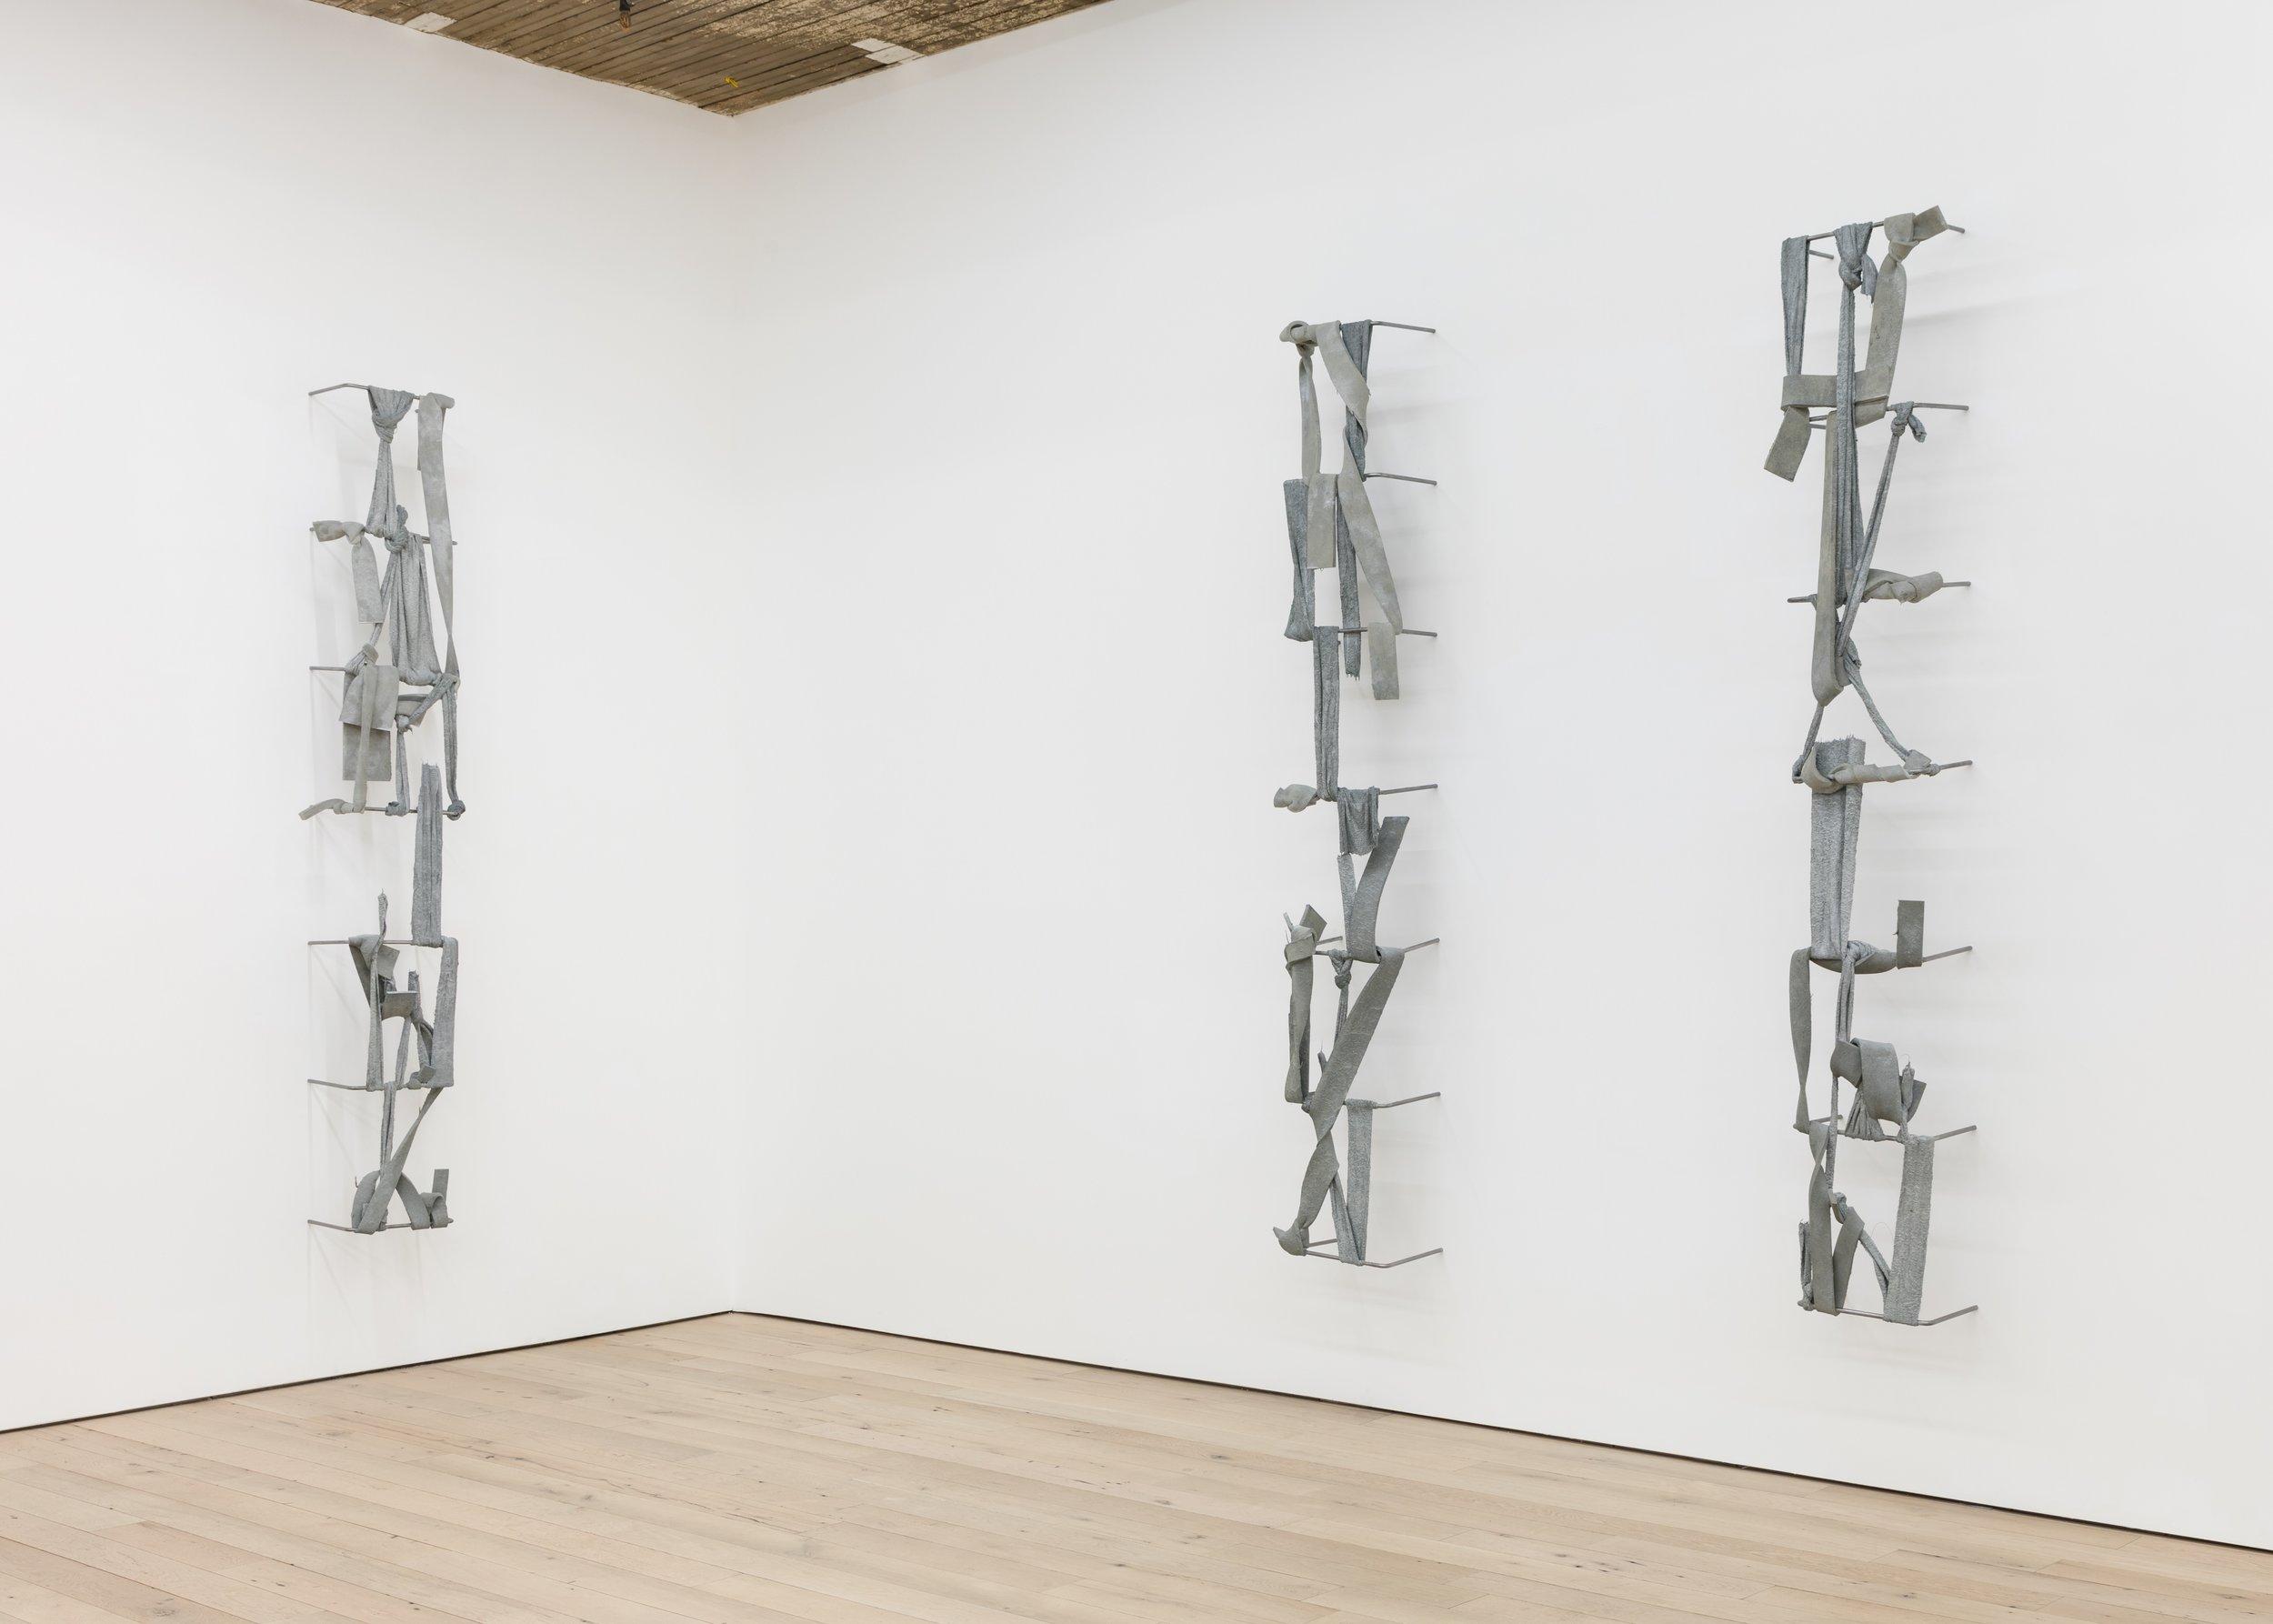 Fall Apart, Martos Gallery, 2019, Installation View 1